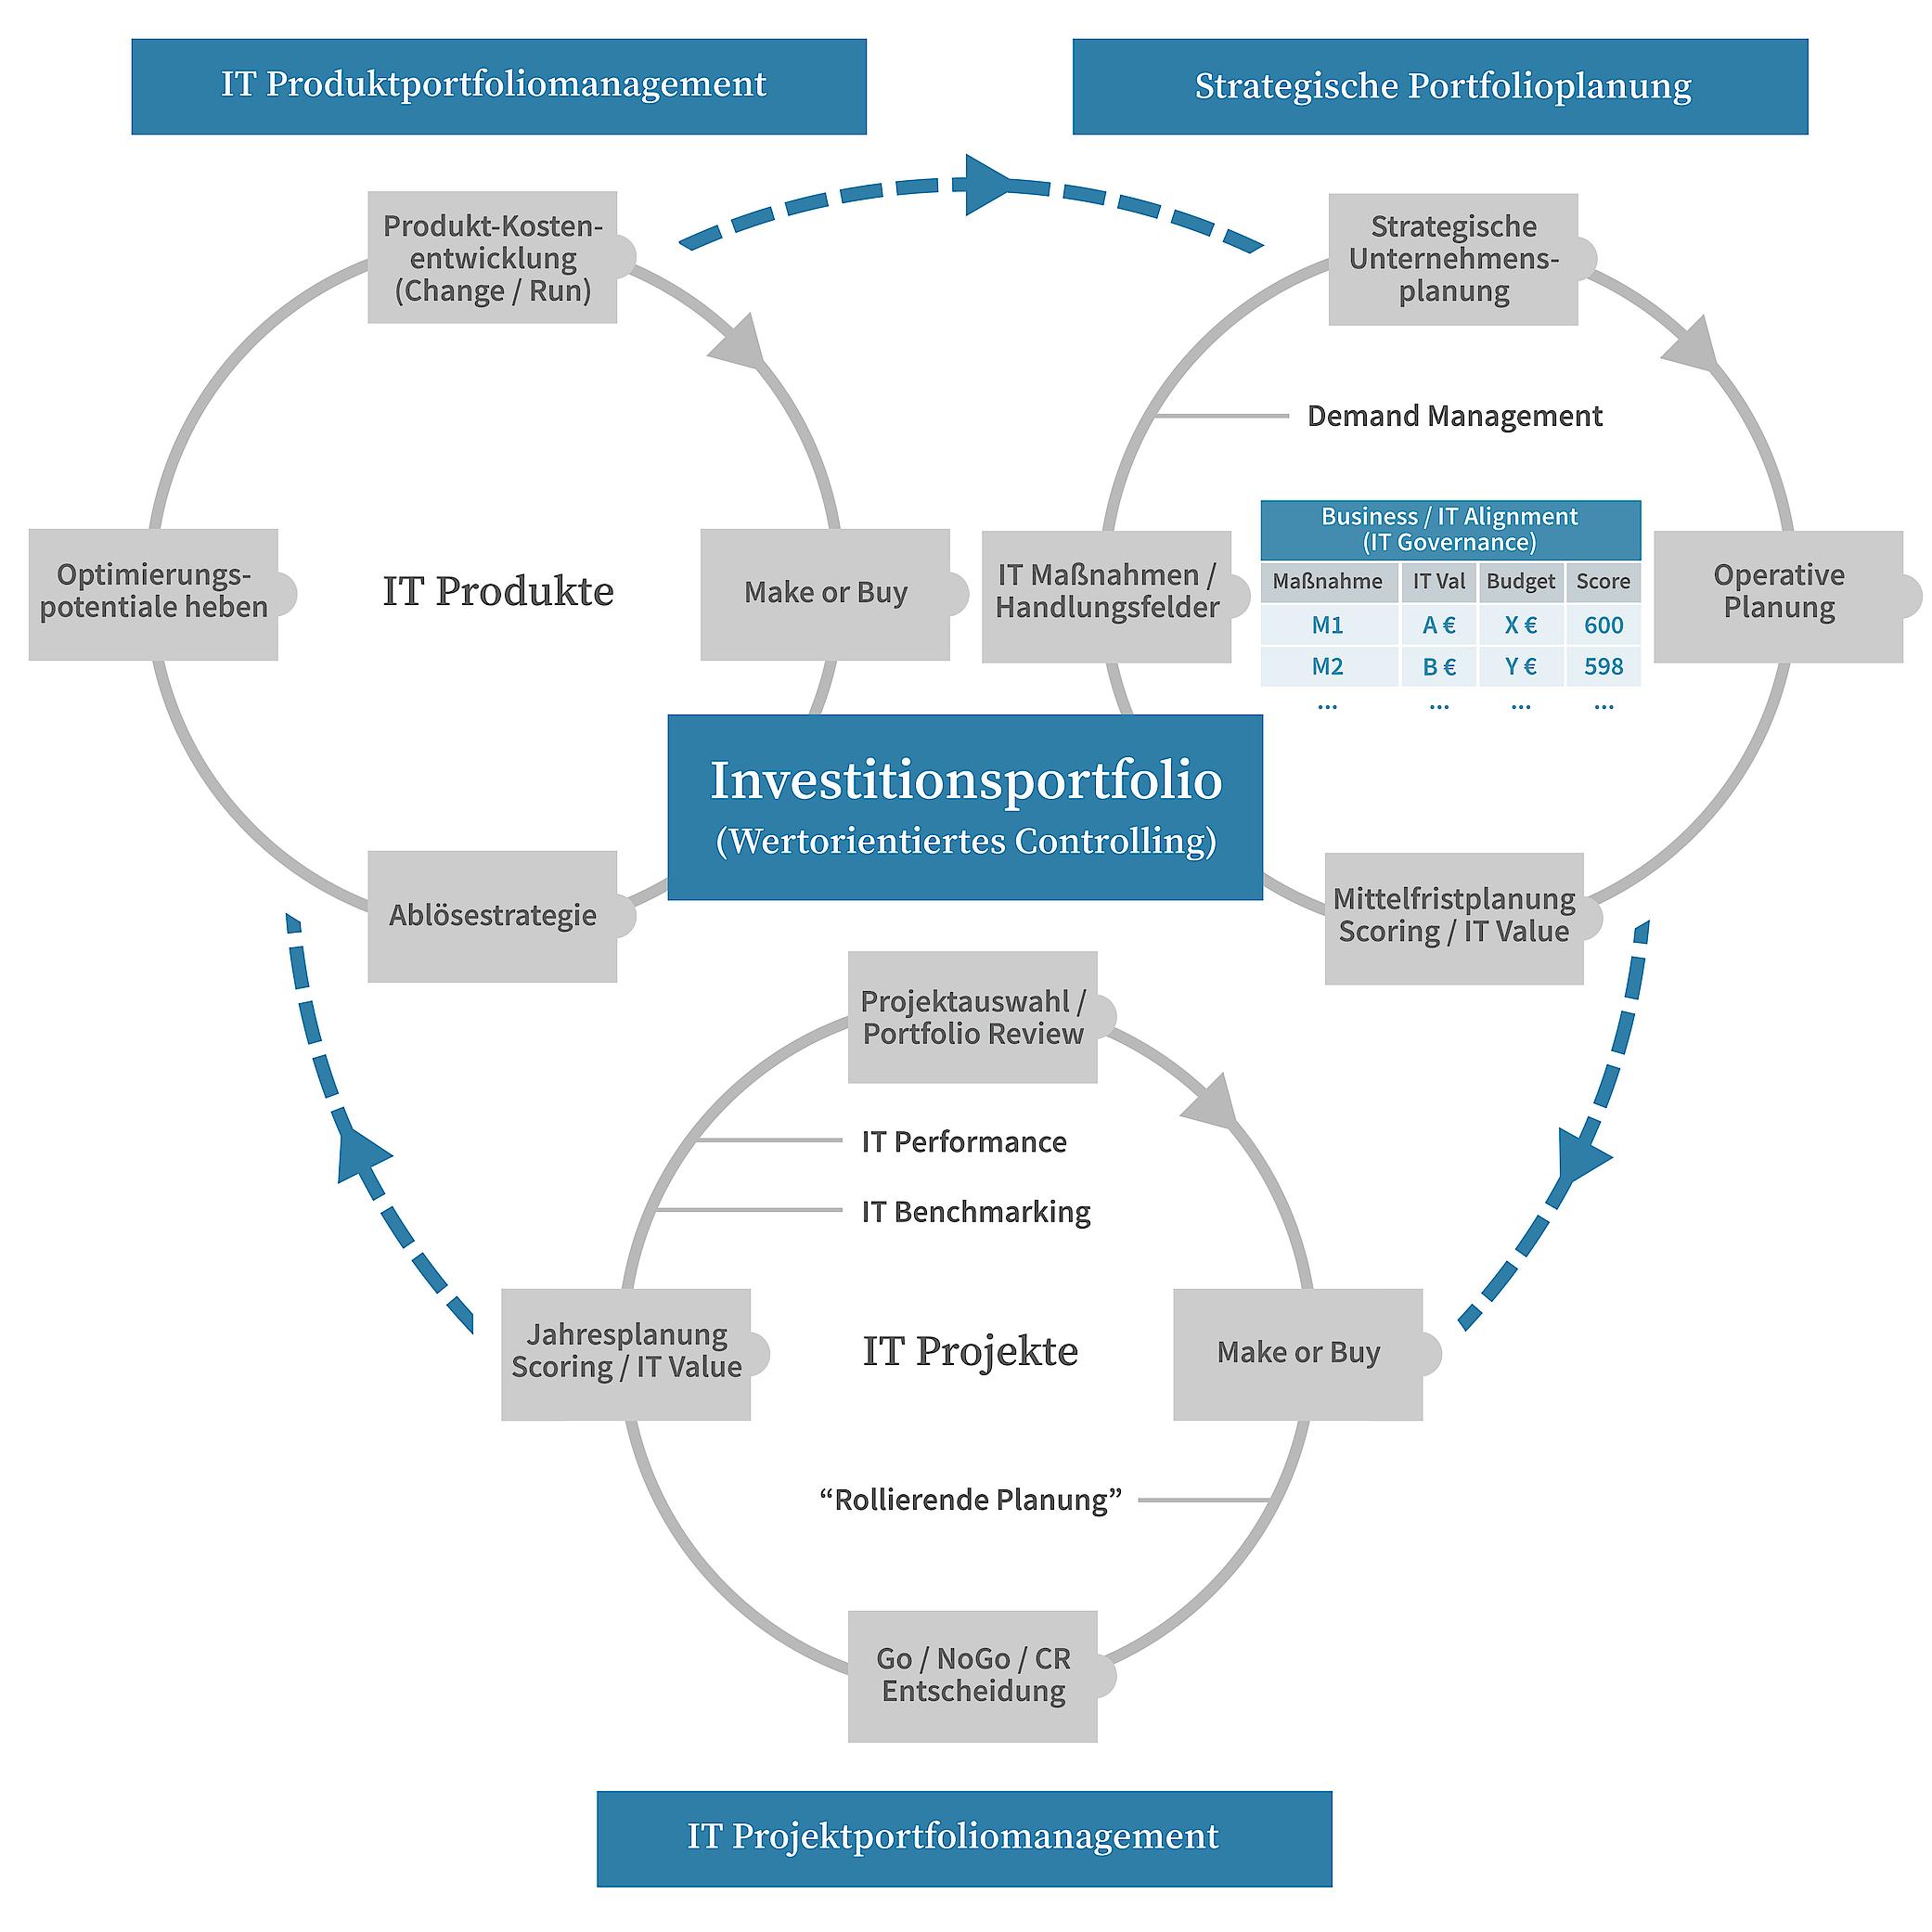 It Projektportfoliomanagement